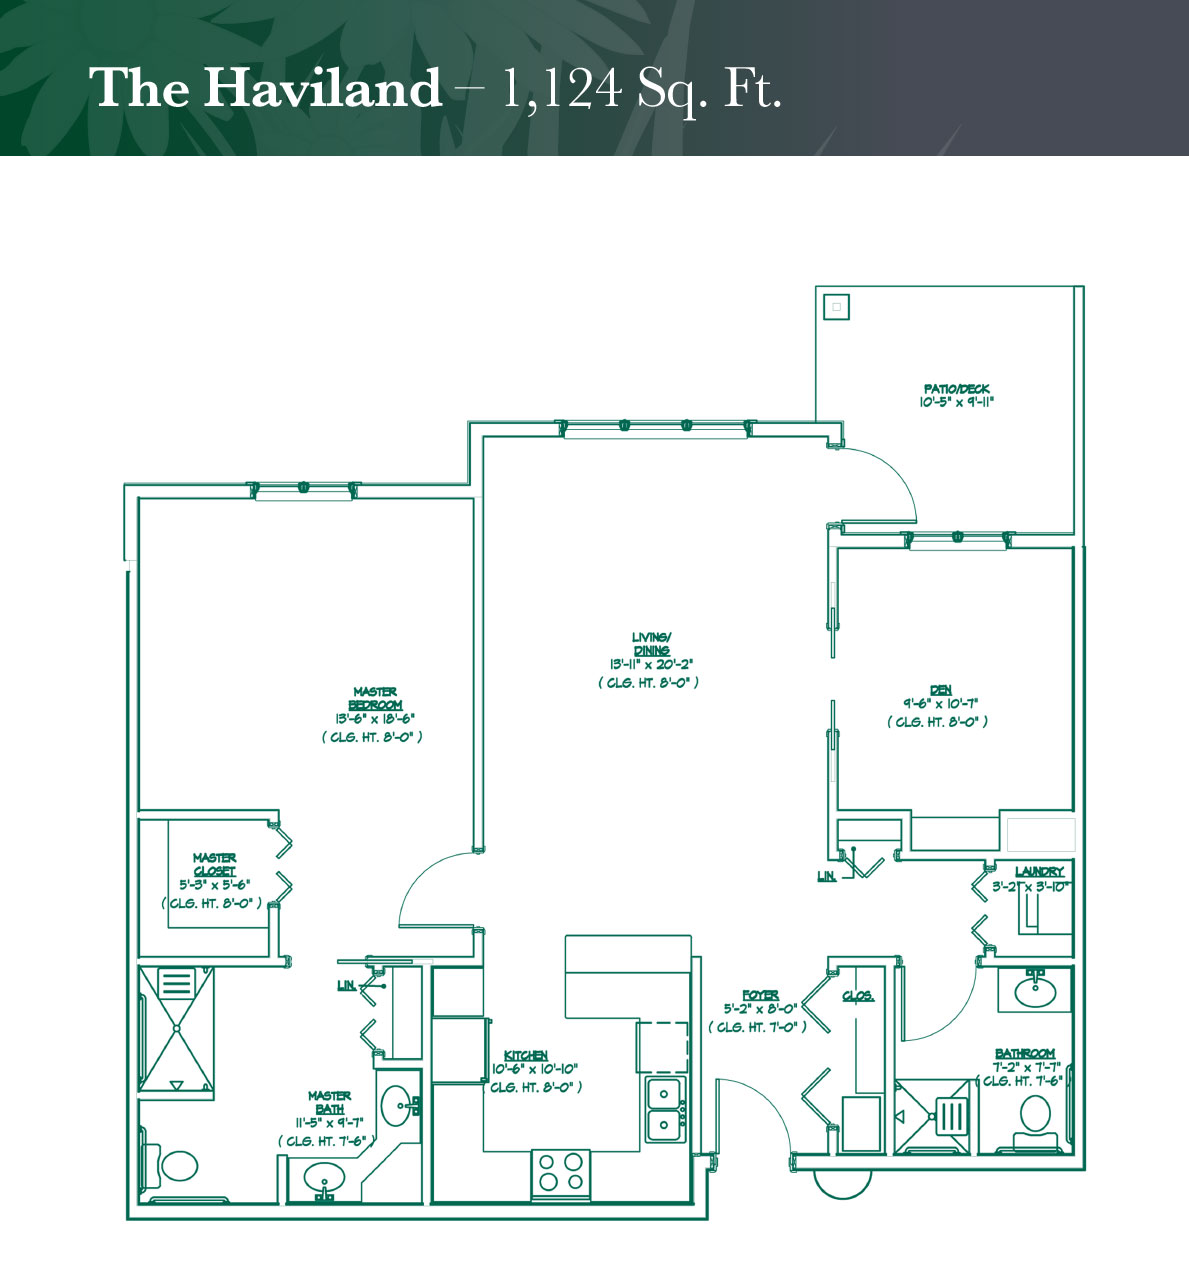 The Haviland floorplan